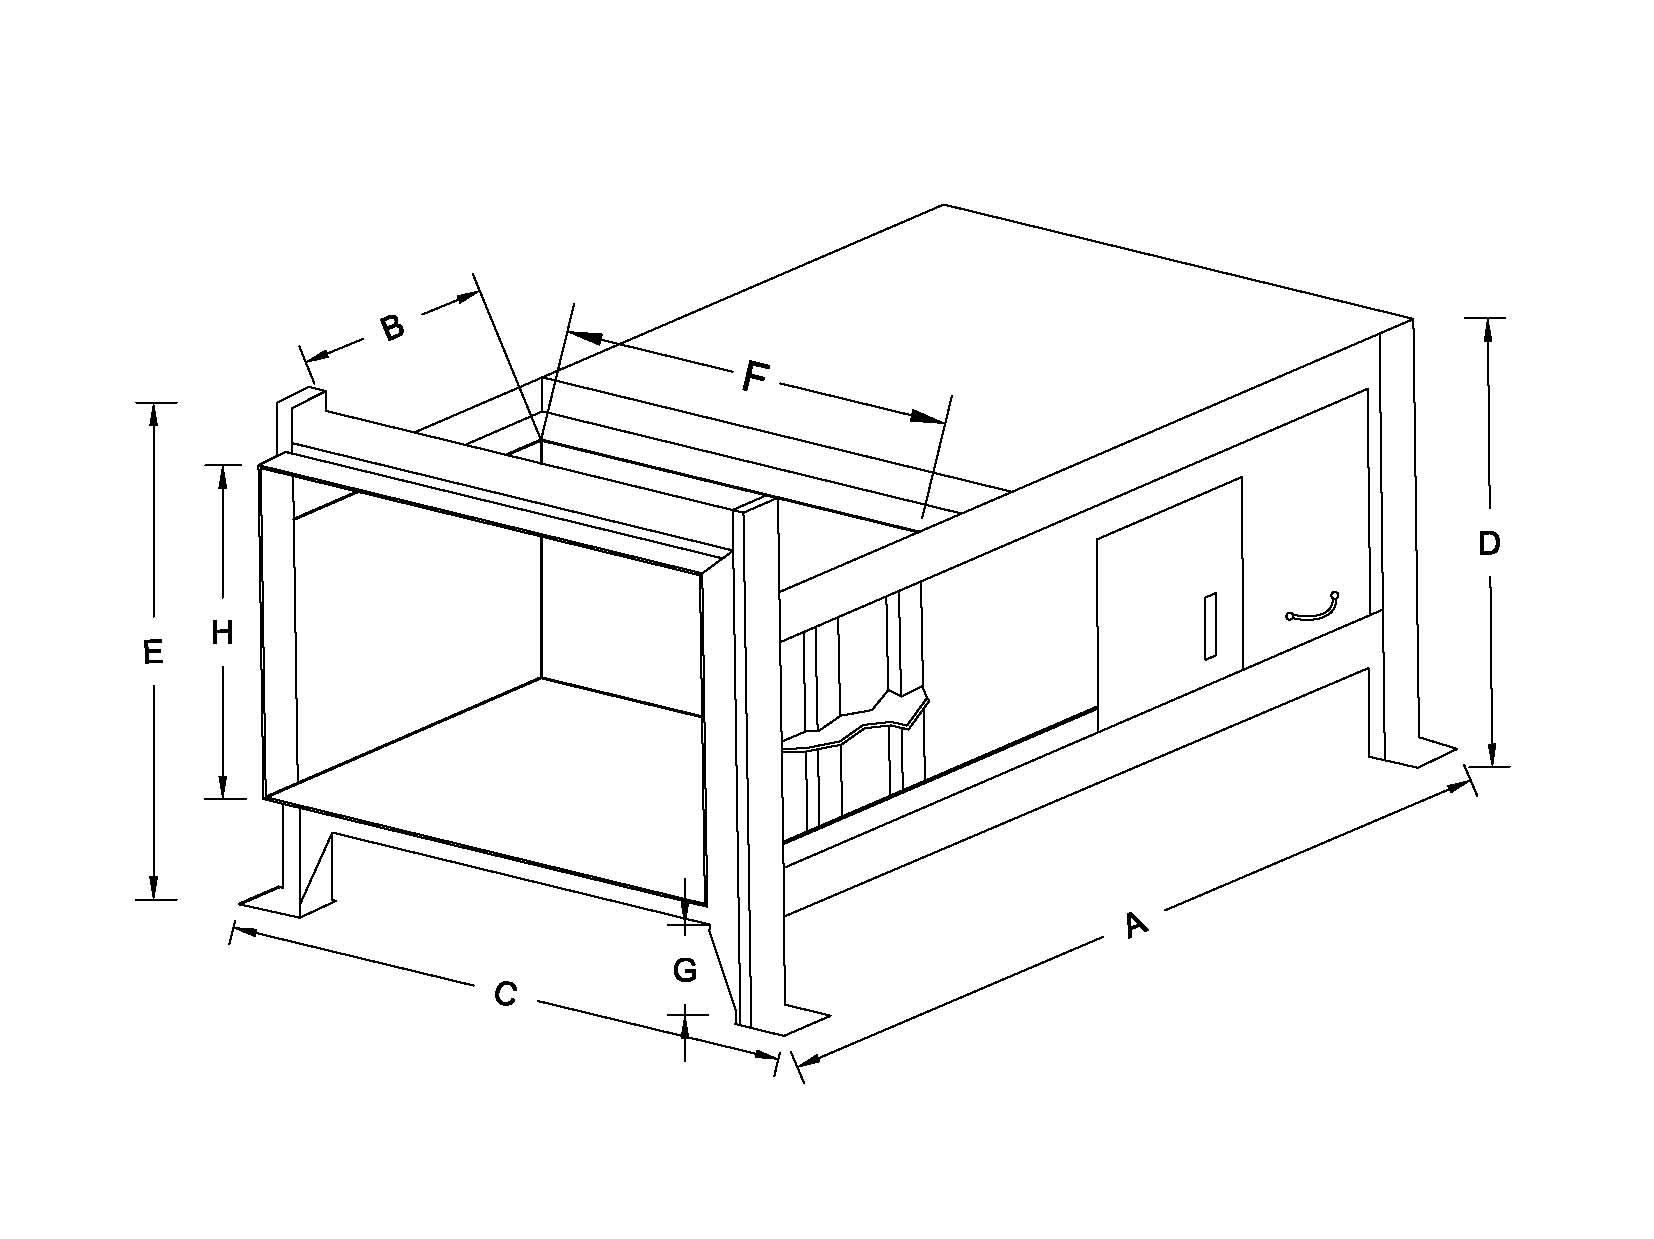 industrial waste compactors wiring diagrams